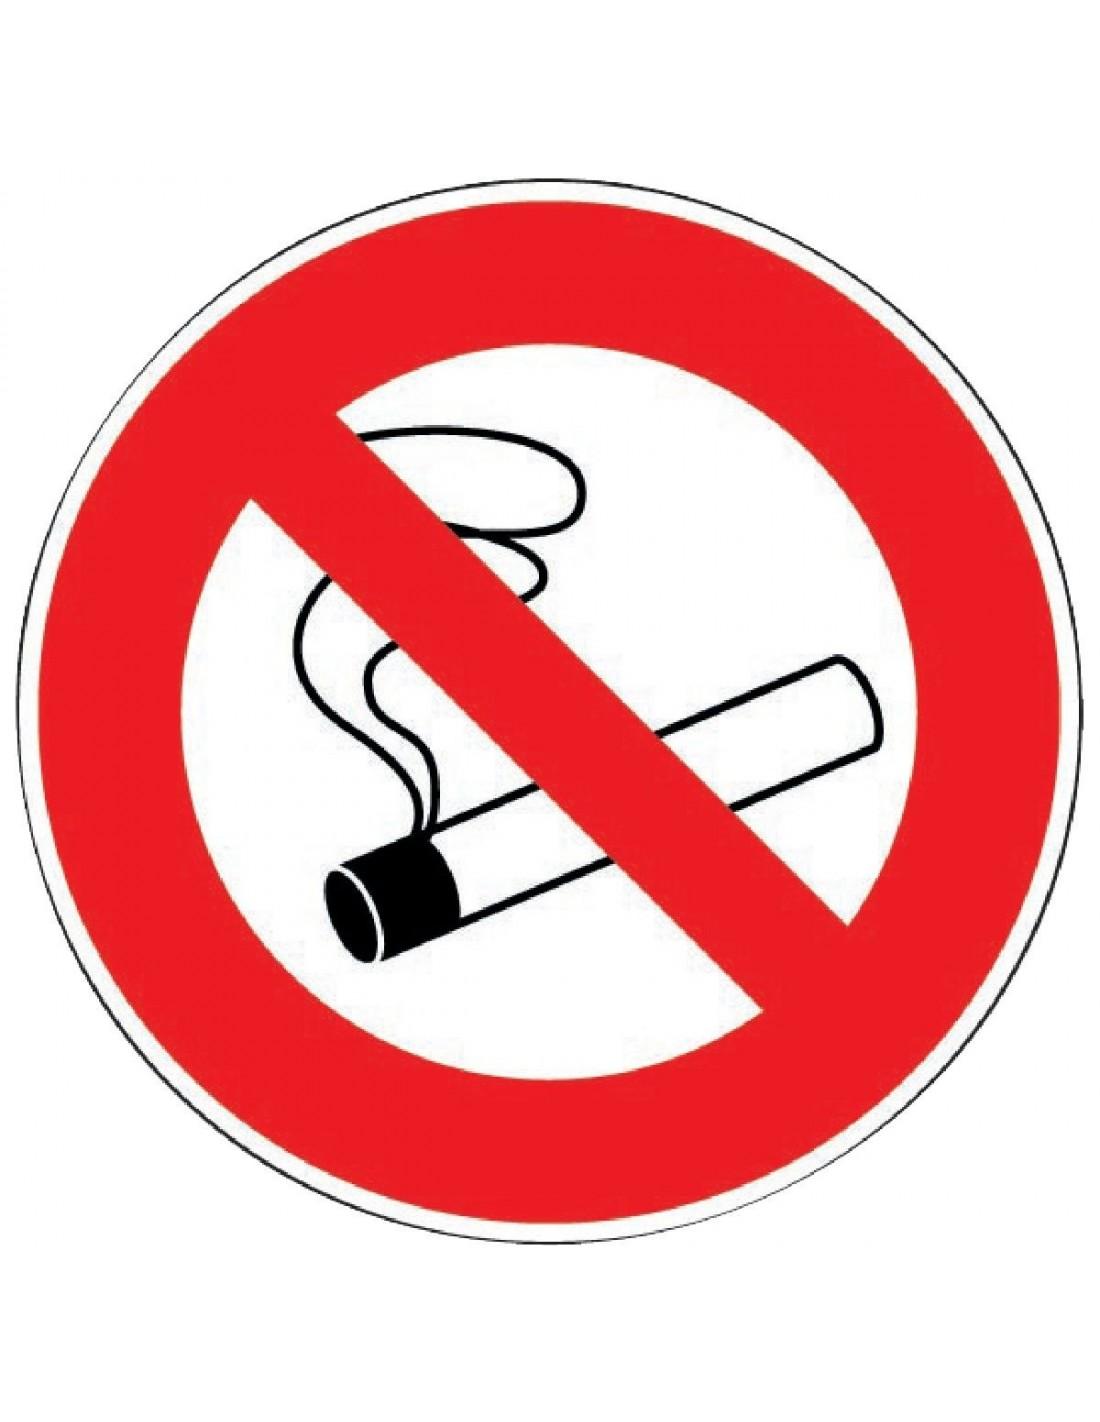 Alan kej comme cesser de fumer